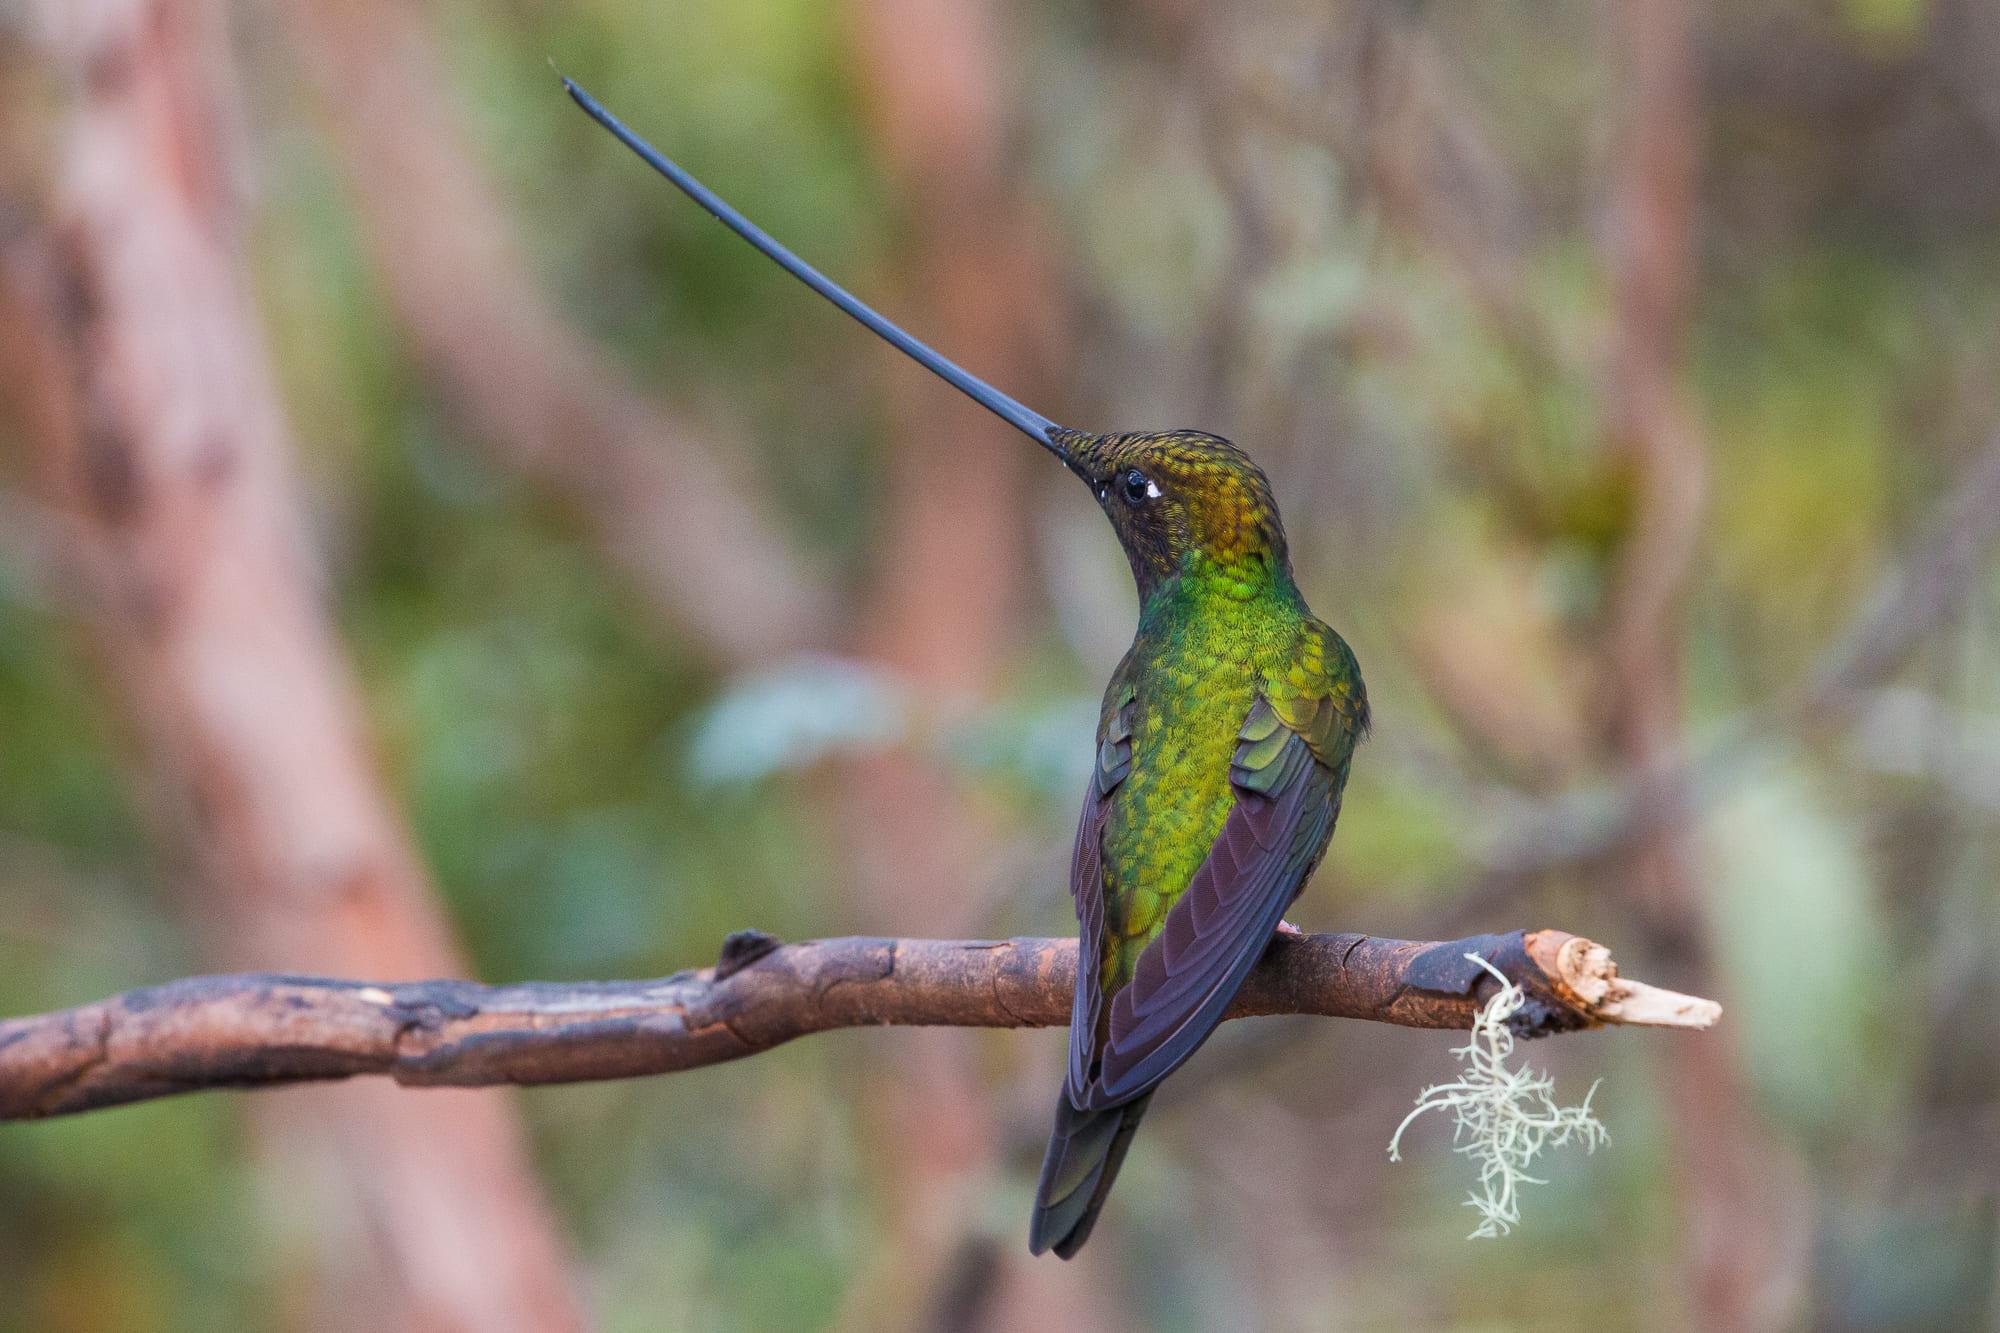 Sword-billed Hummingbird in Ecuador.